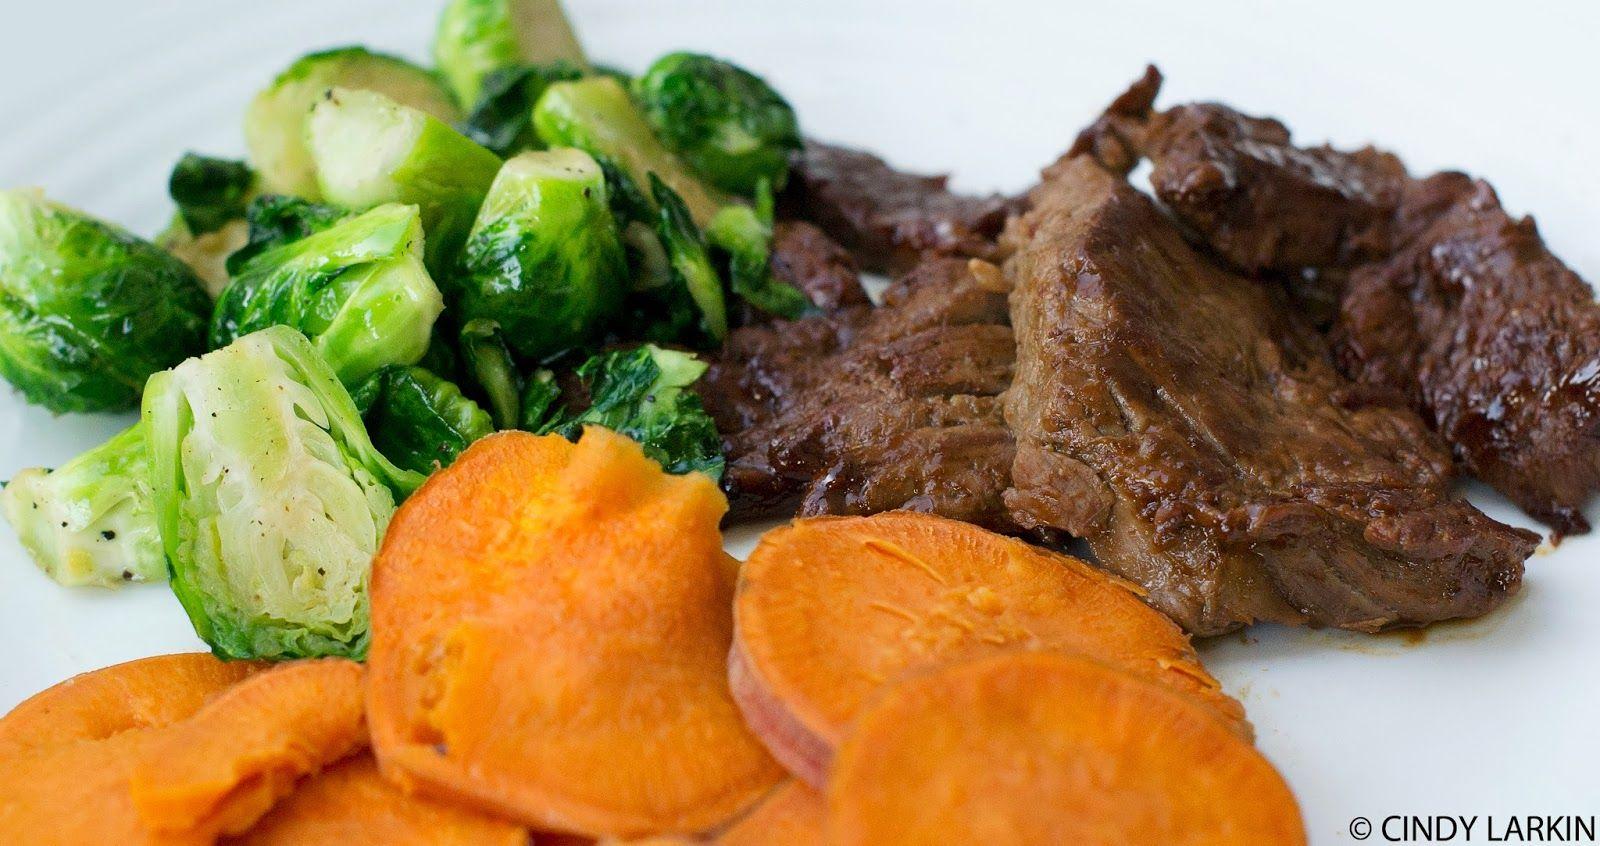 Las Vegas Food Photographer: Cindy Larkin: Marinated Steak...Mmmm SO good!